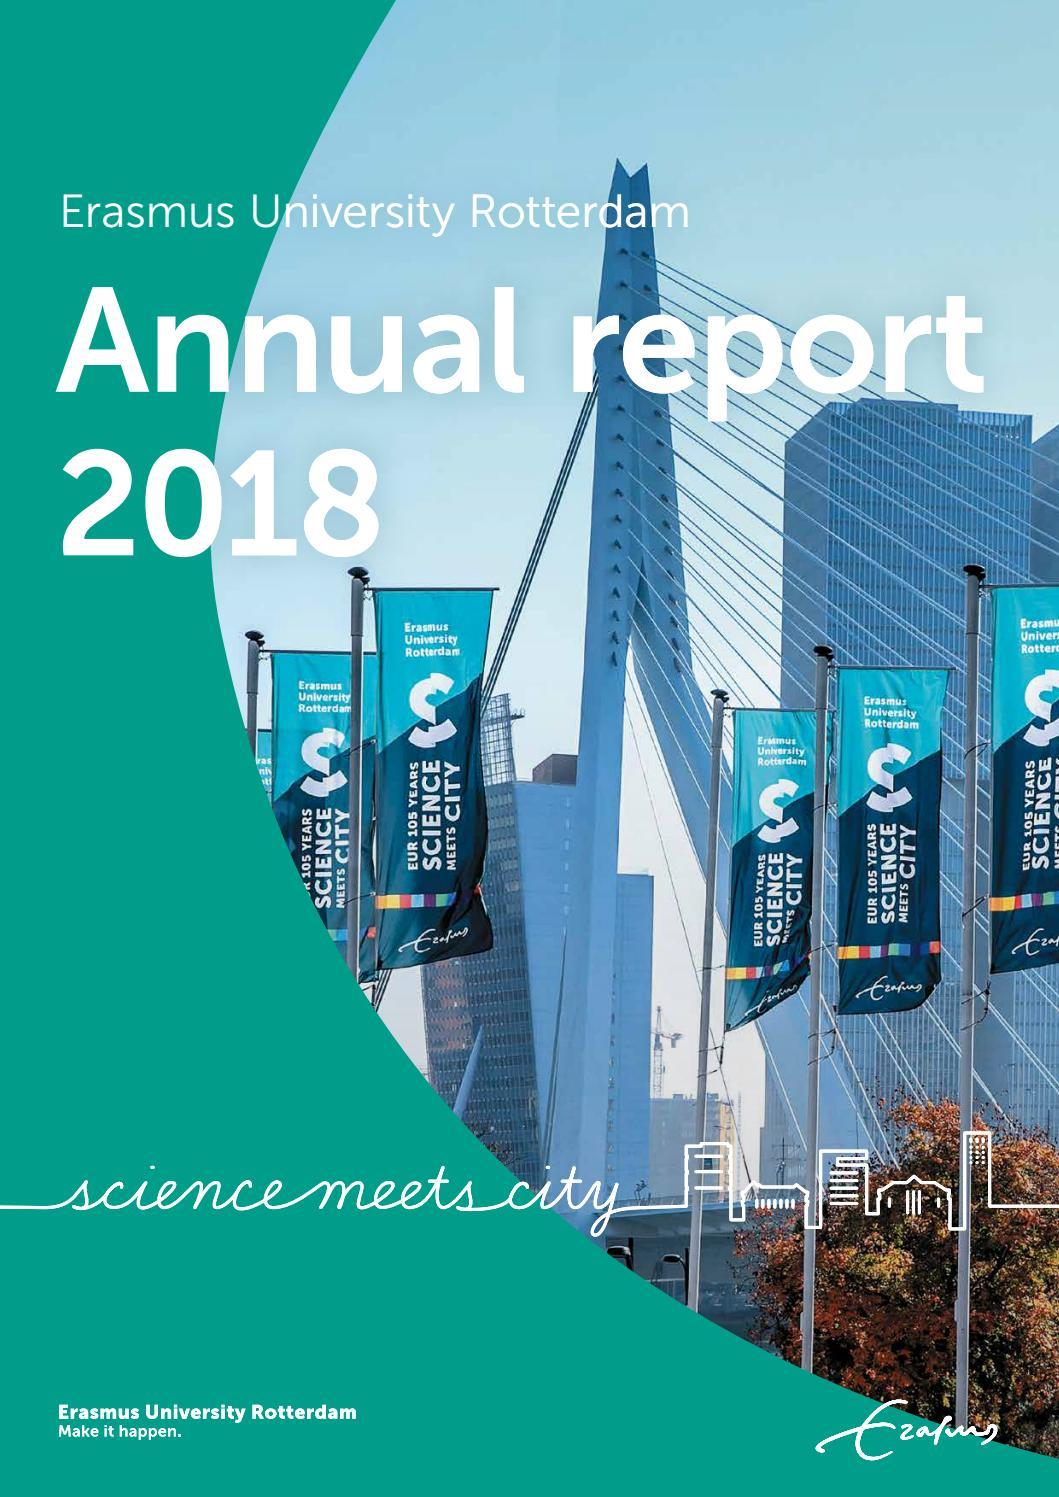 Erasmus University Rotterdam - Annual Report 2018 by Erasmus